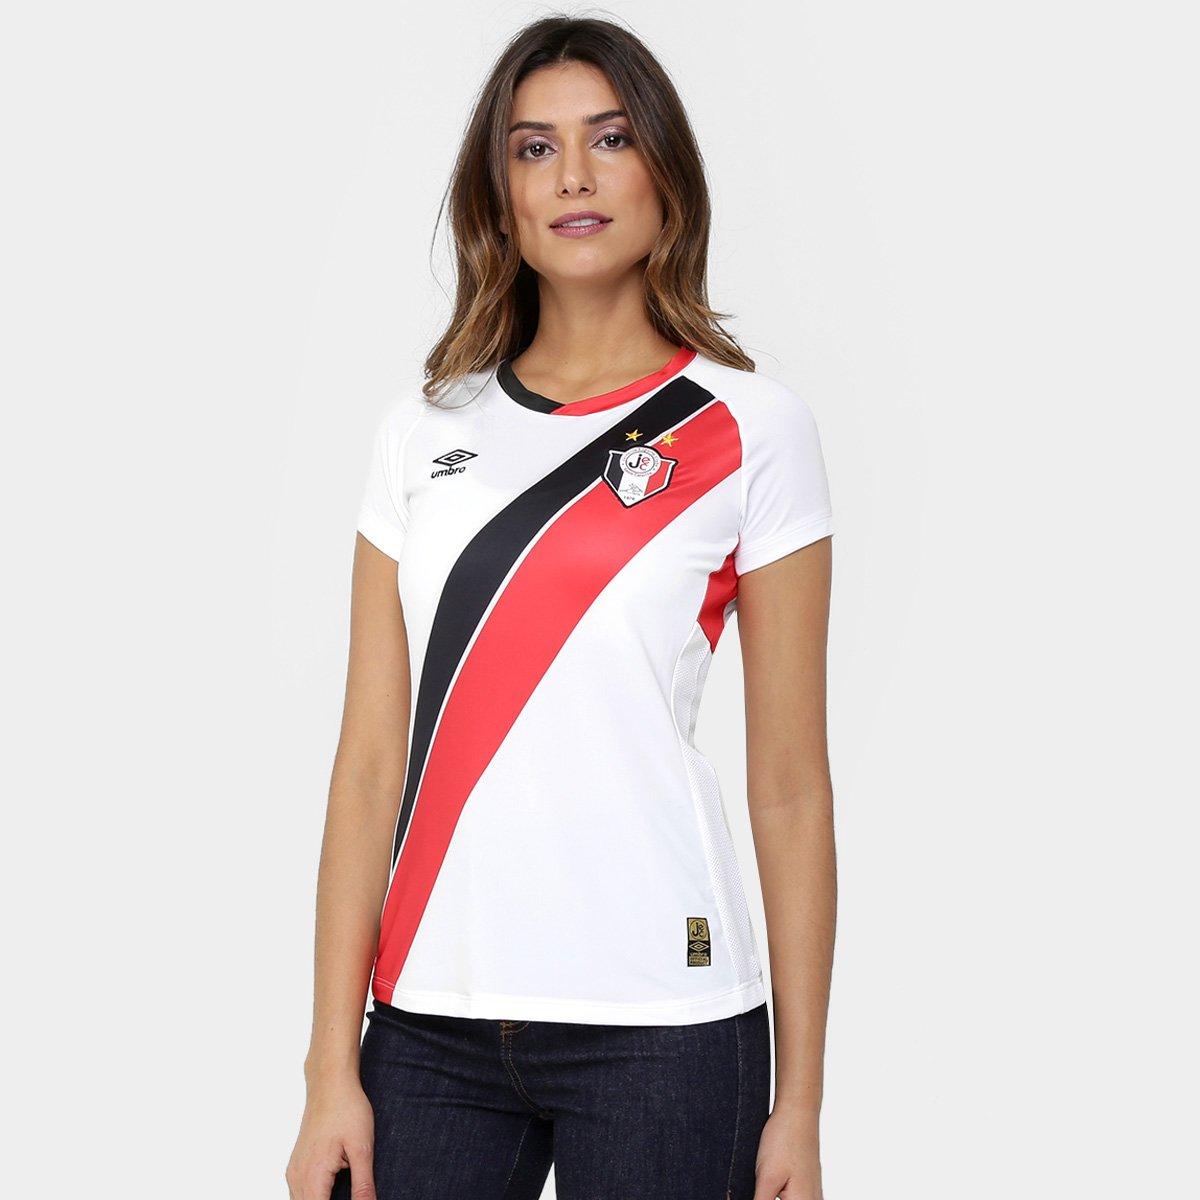 e26fe5c61d767 Camisa Joinville II 2015 s nº Torcedor Umbro Feminina